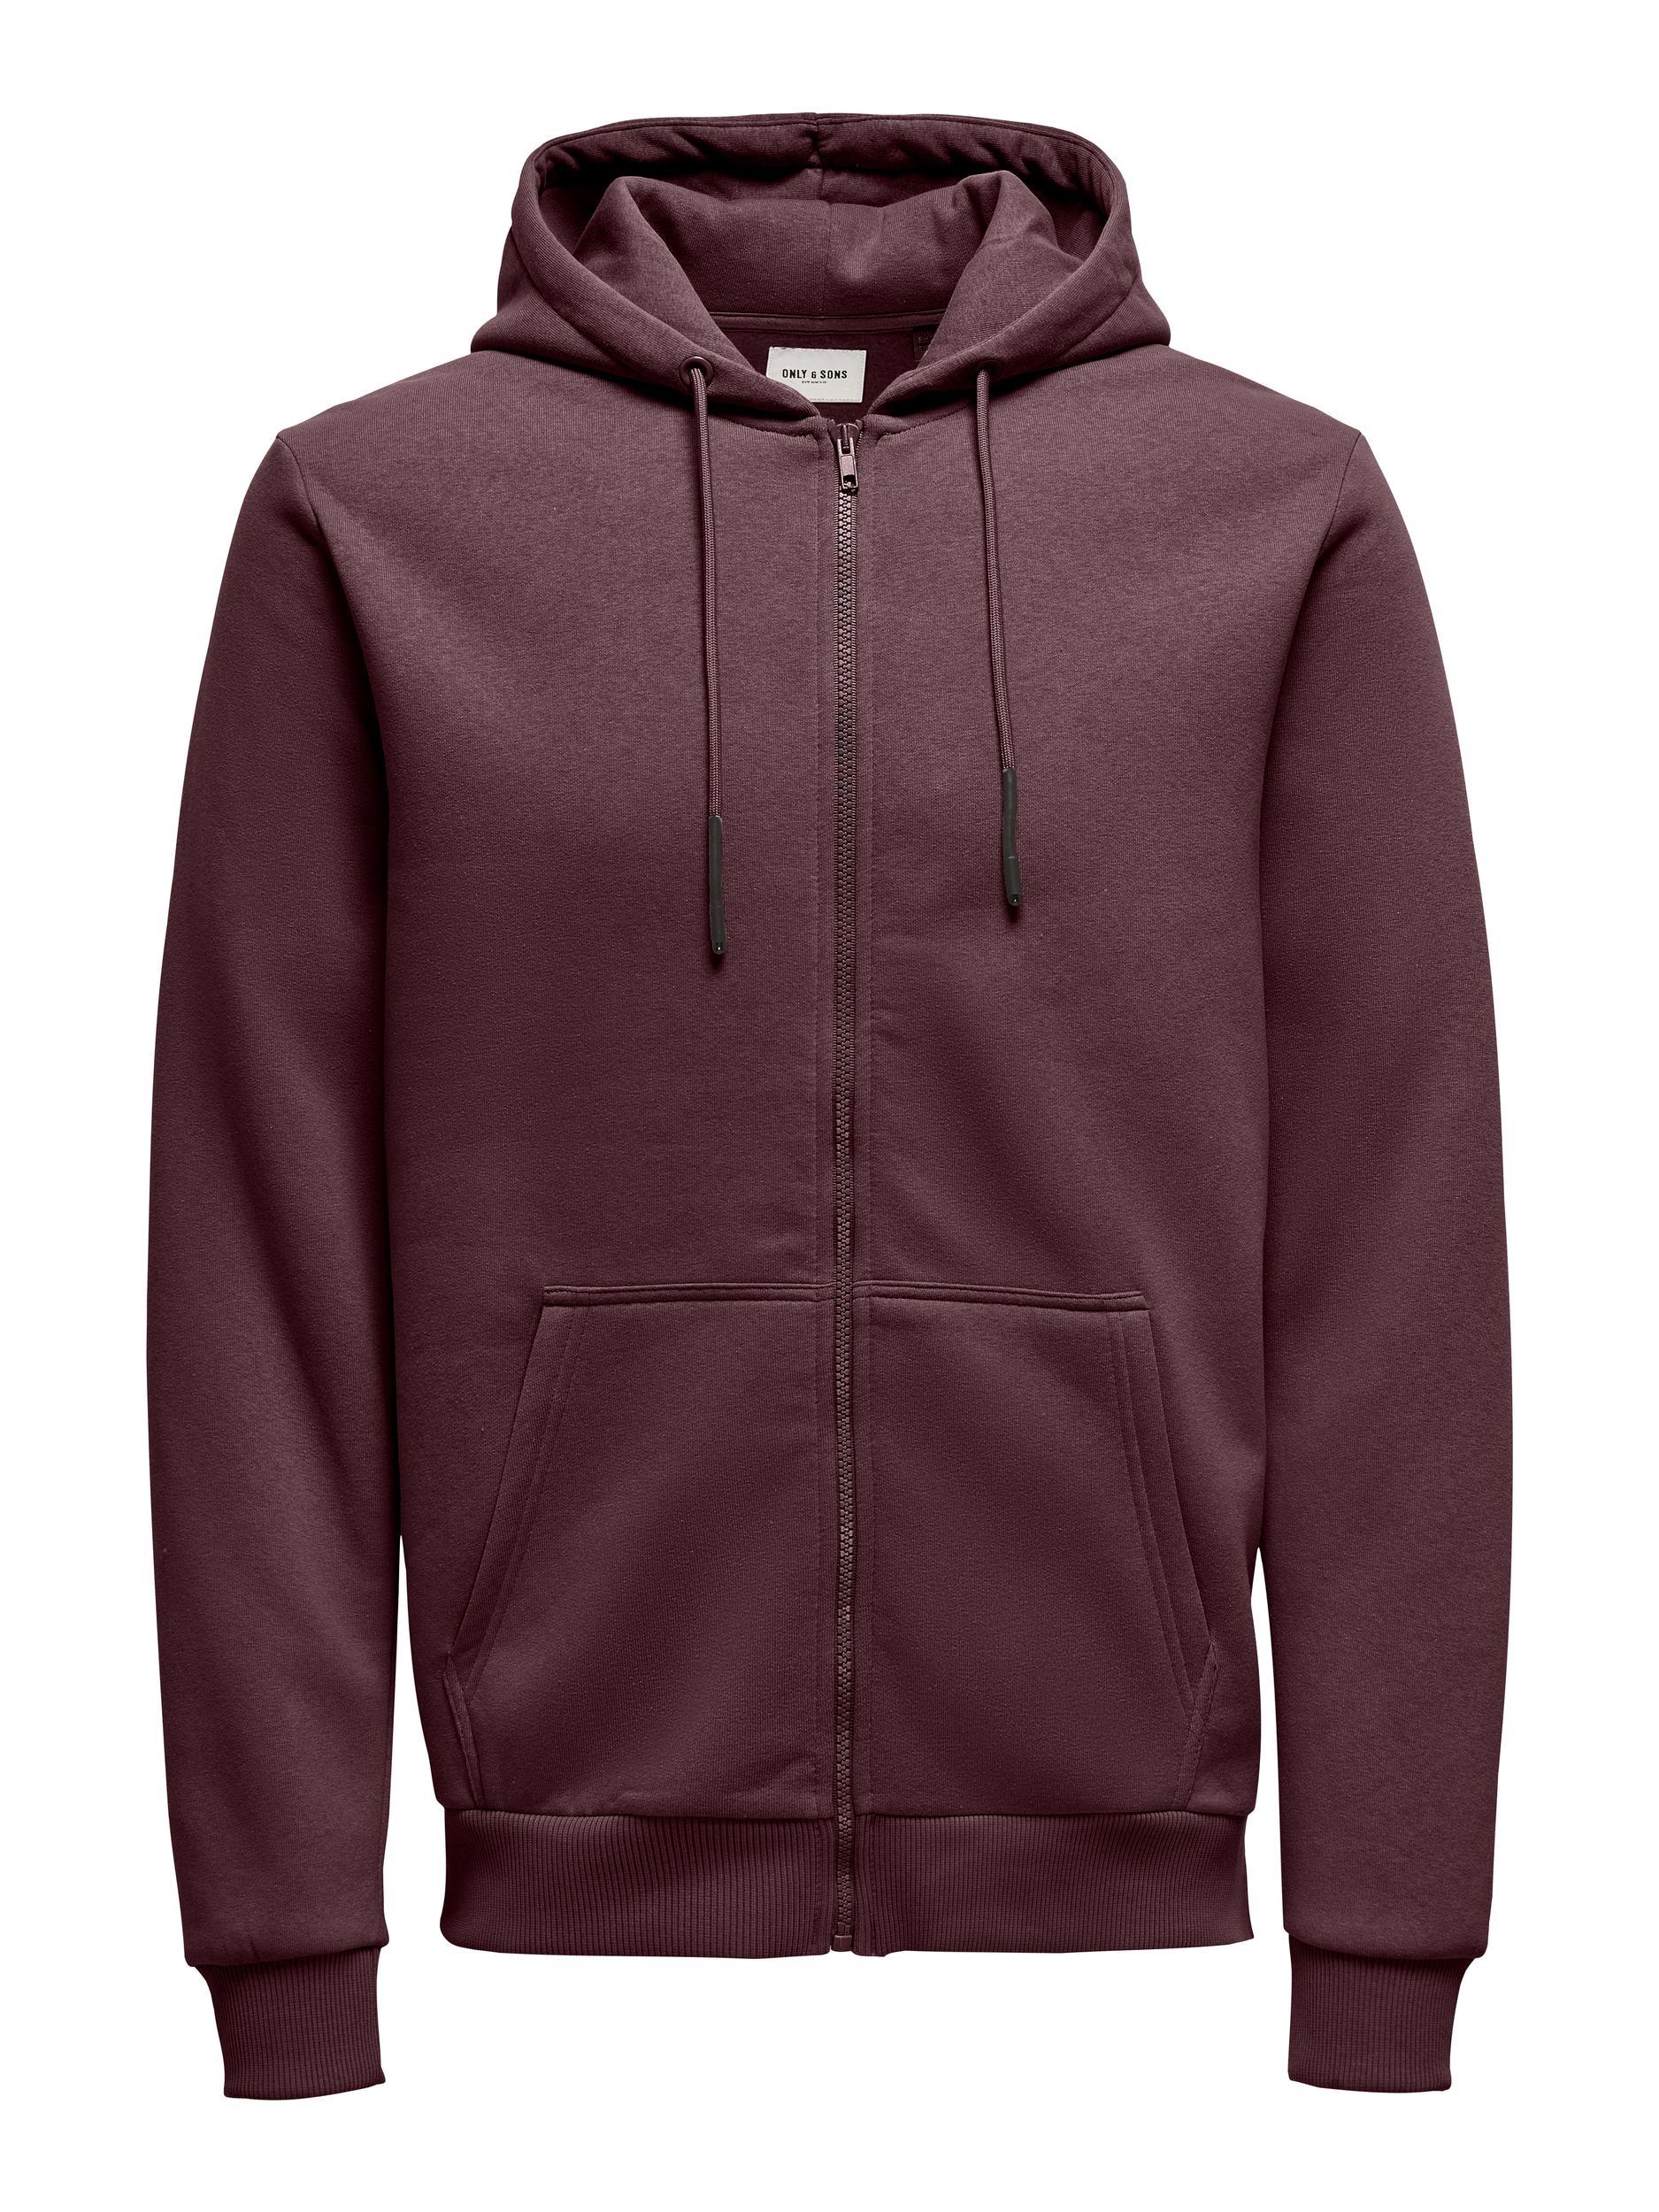 Only & Sons Ceres Life Zip hoodie, fudge, large